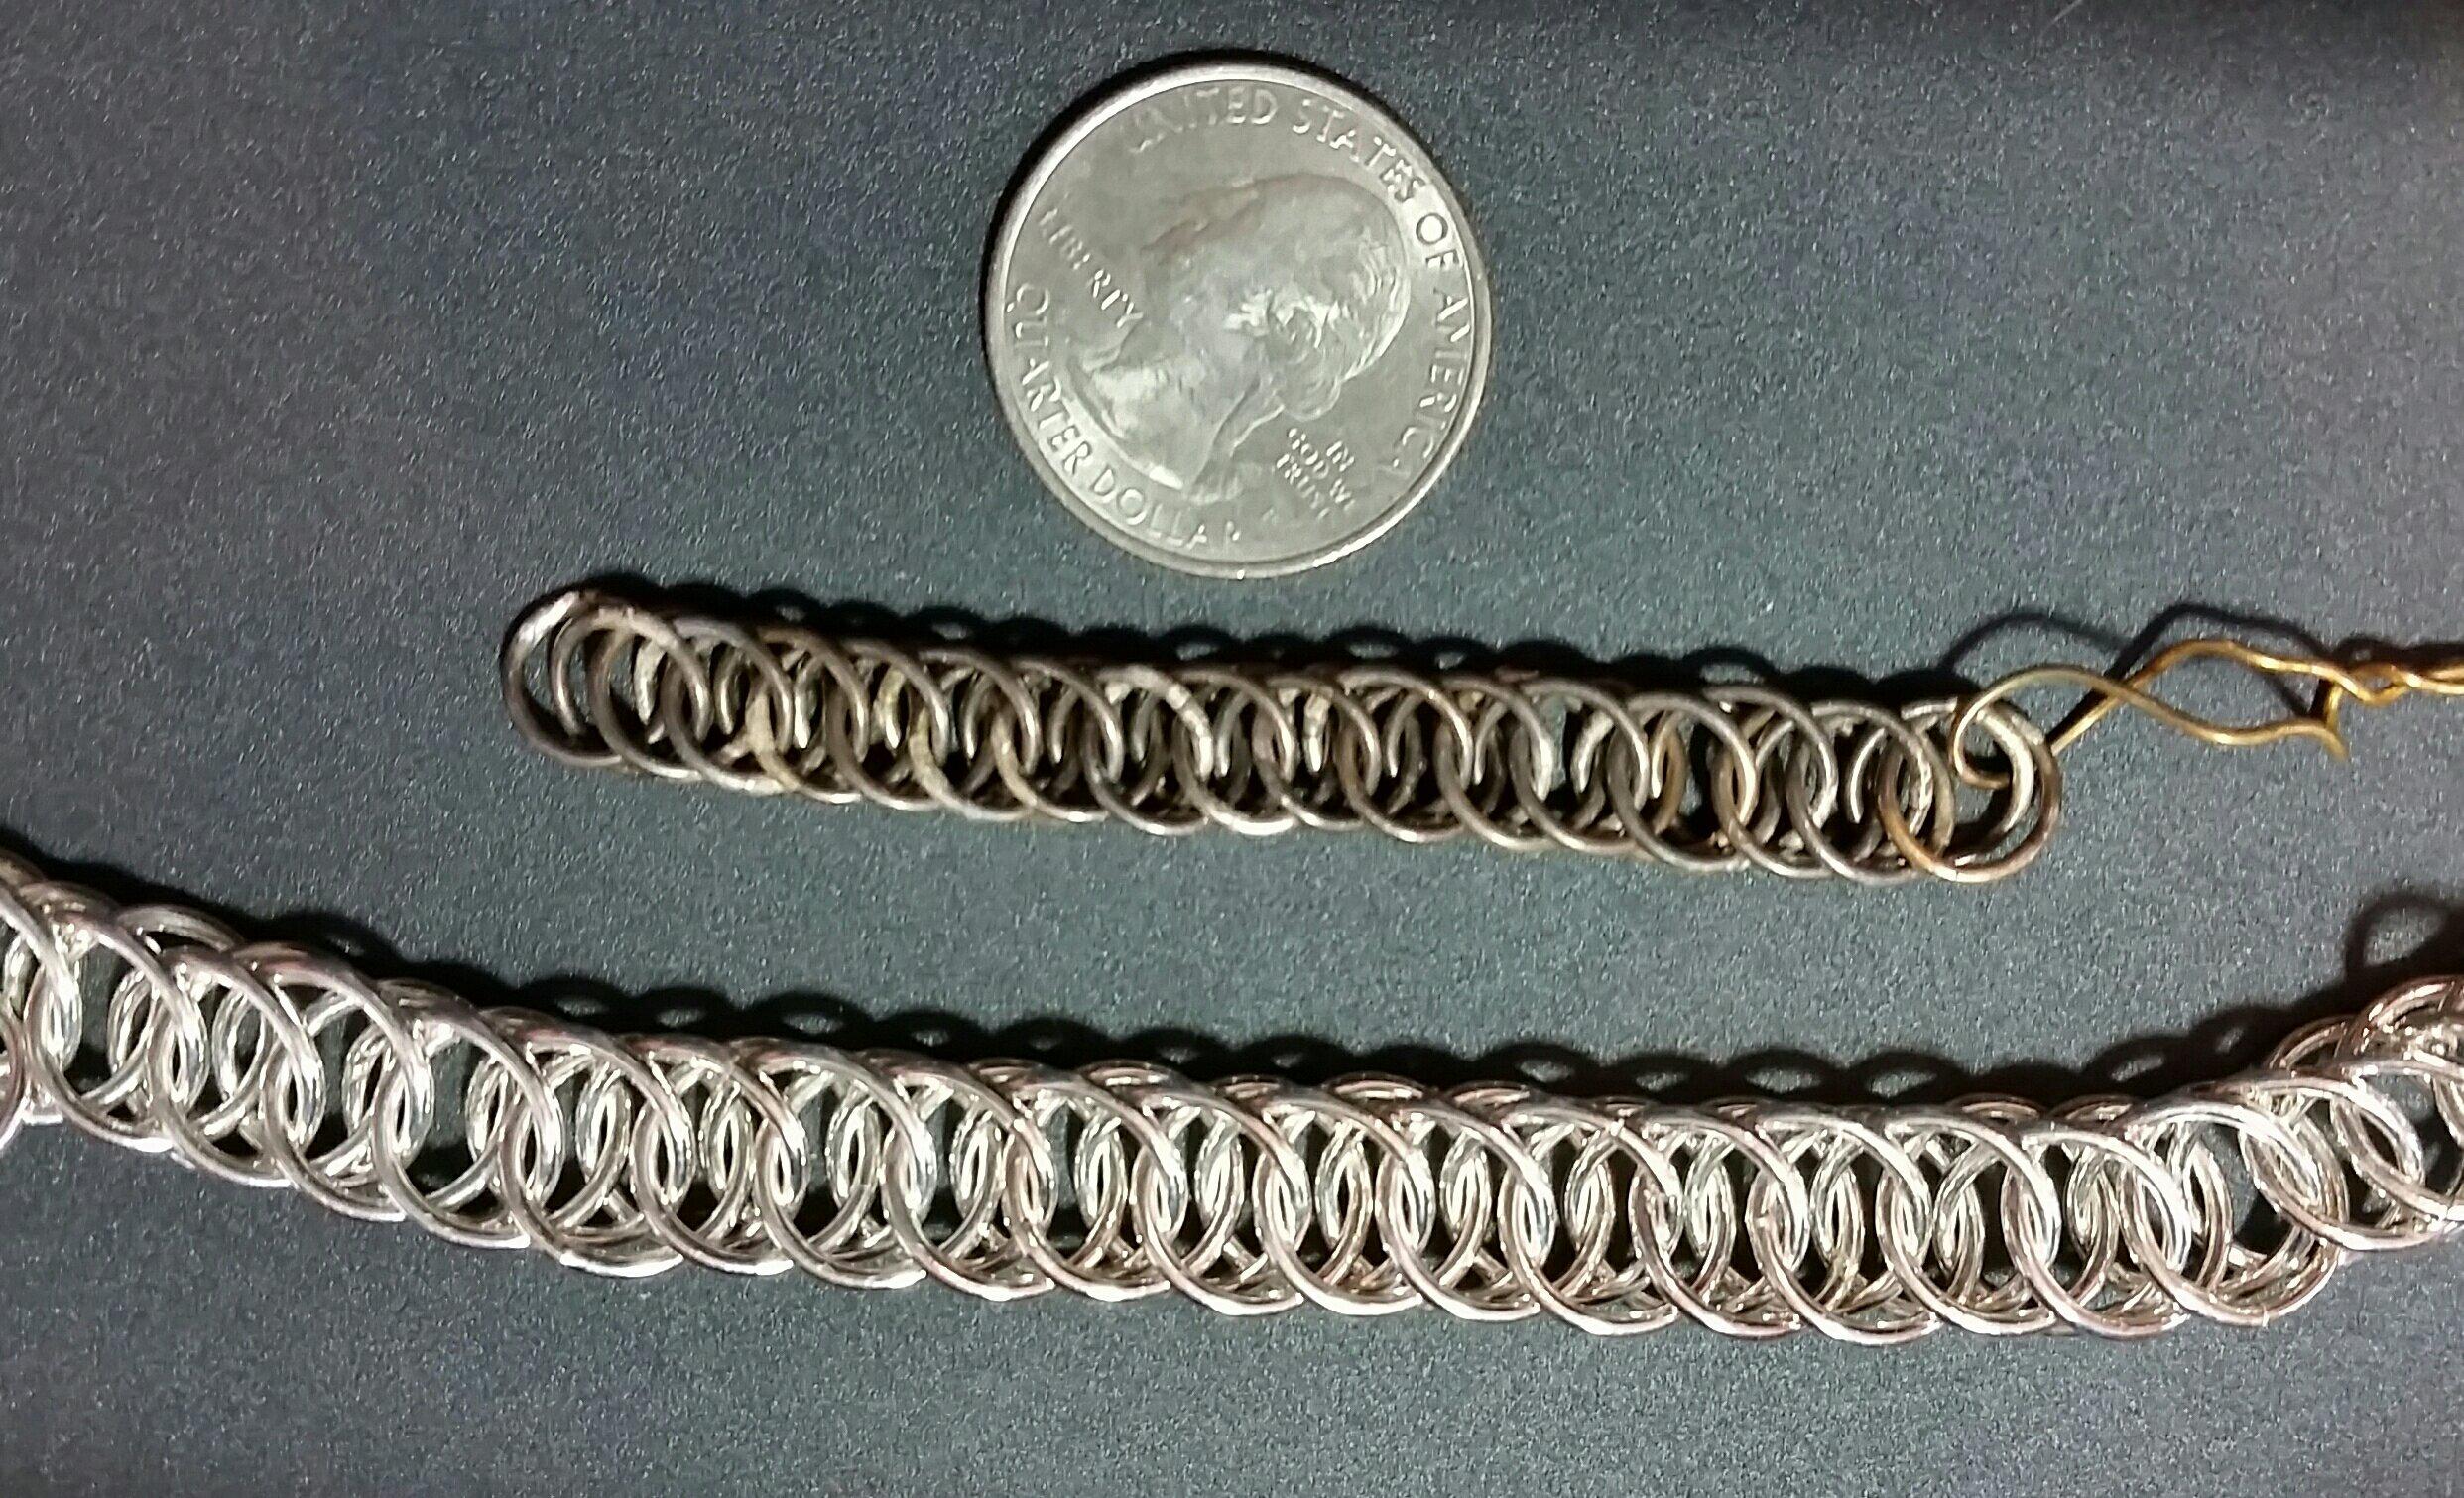 2 sizes of Columbus Chain